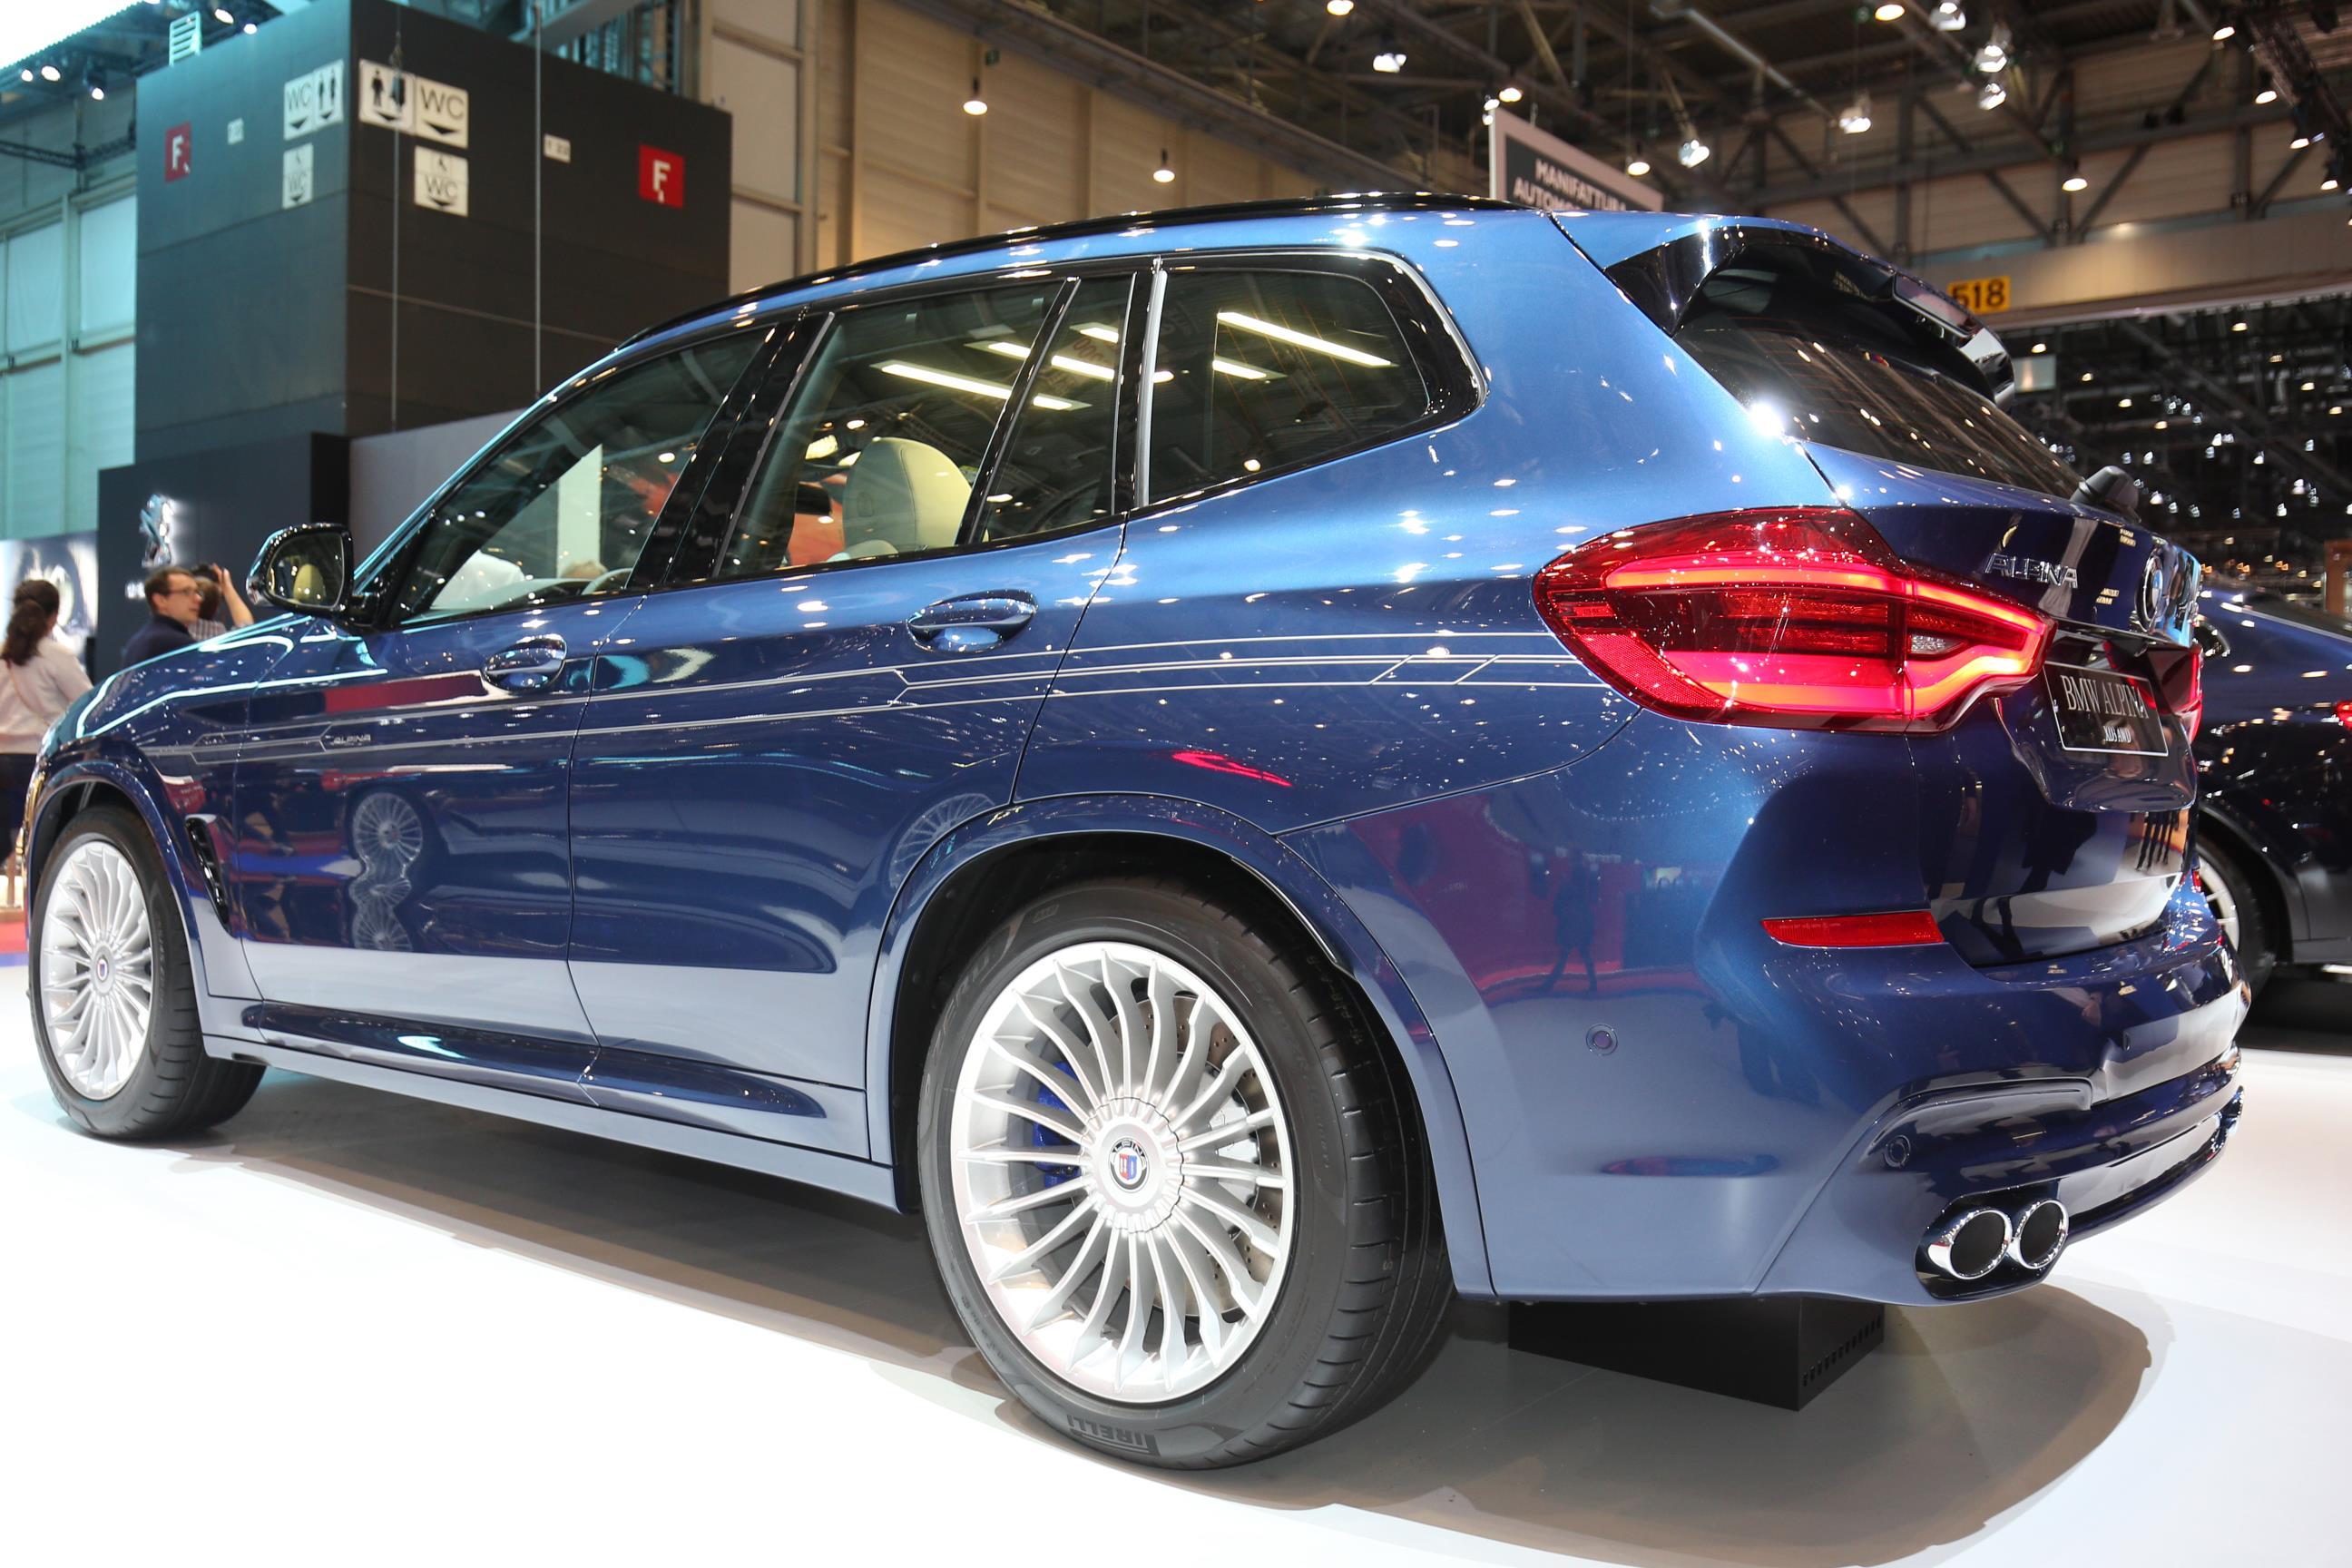 Geneva Motor Show 2018 Mega Gallery Part 2 (156)